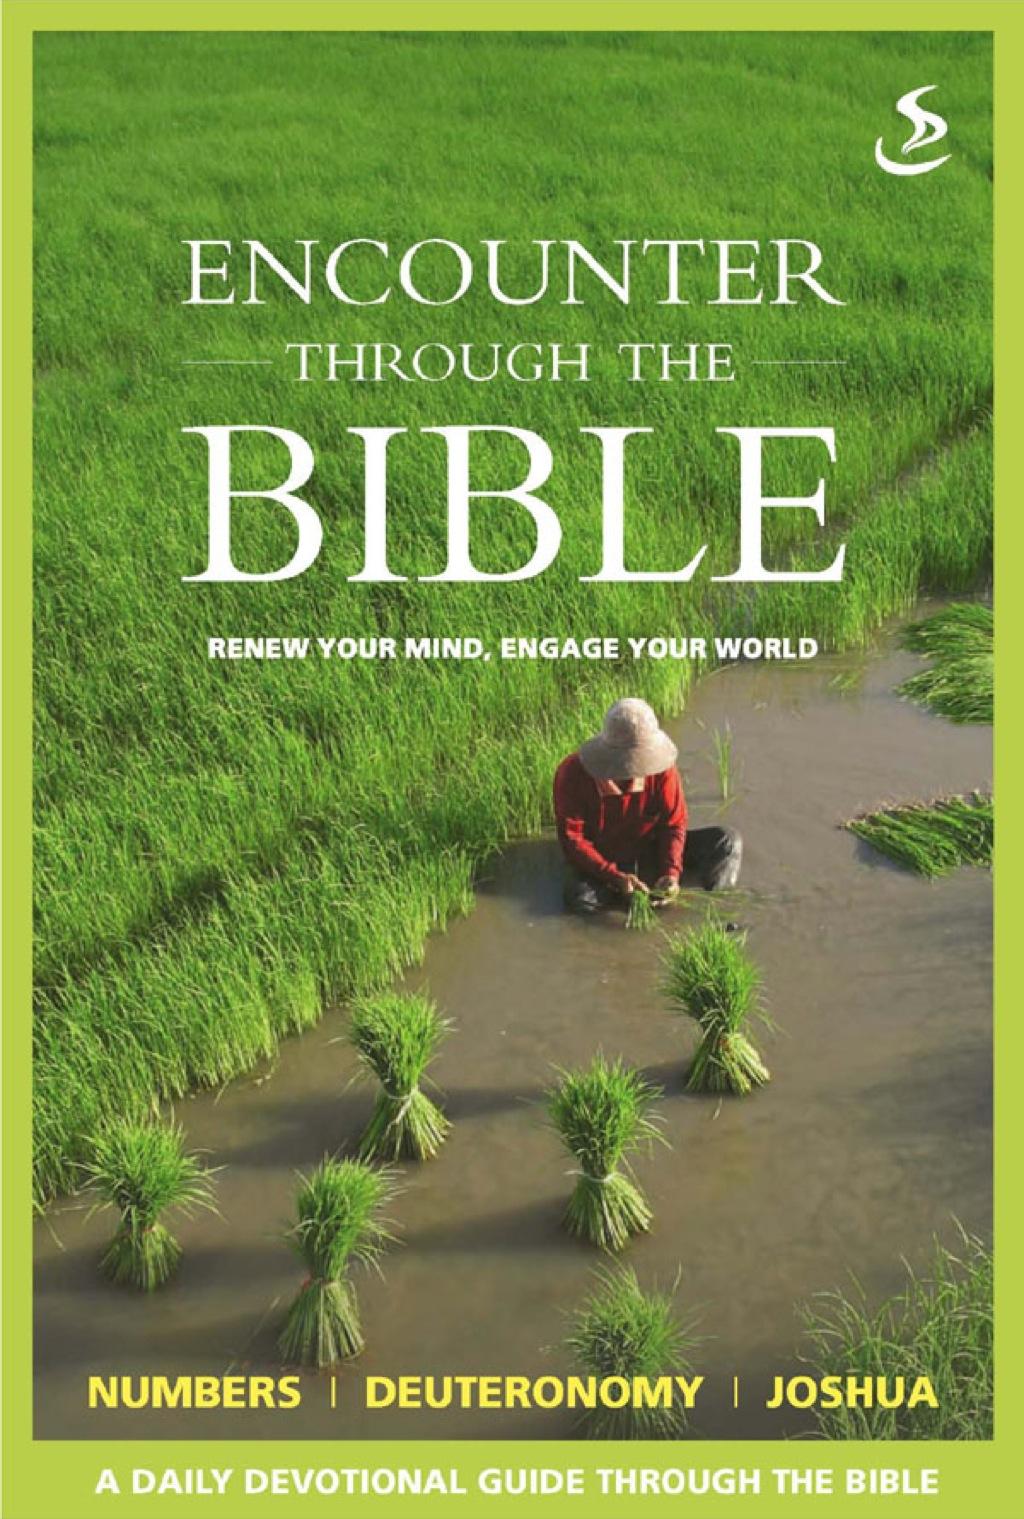 Encounter through the Bible - Numbers - Deuteronomy - Joshua (eBook)